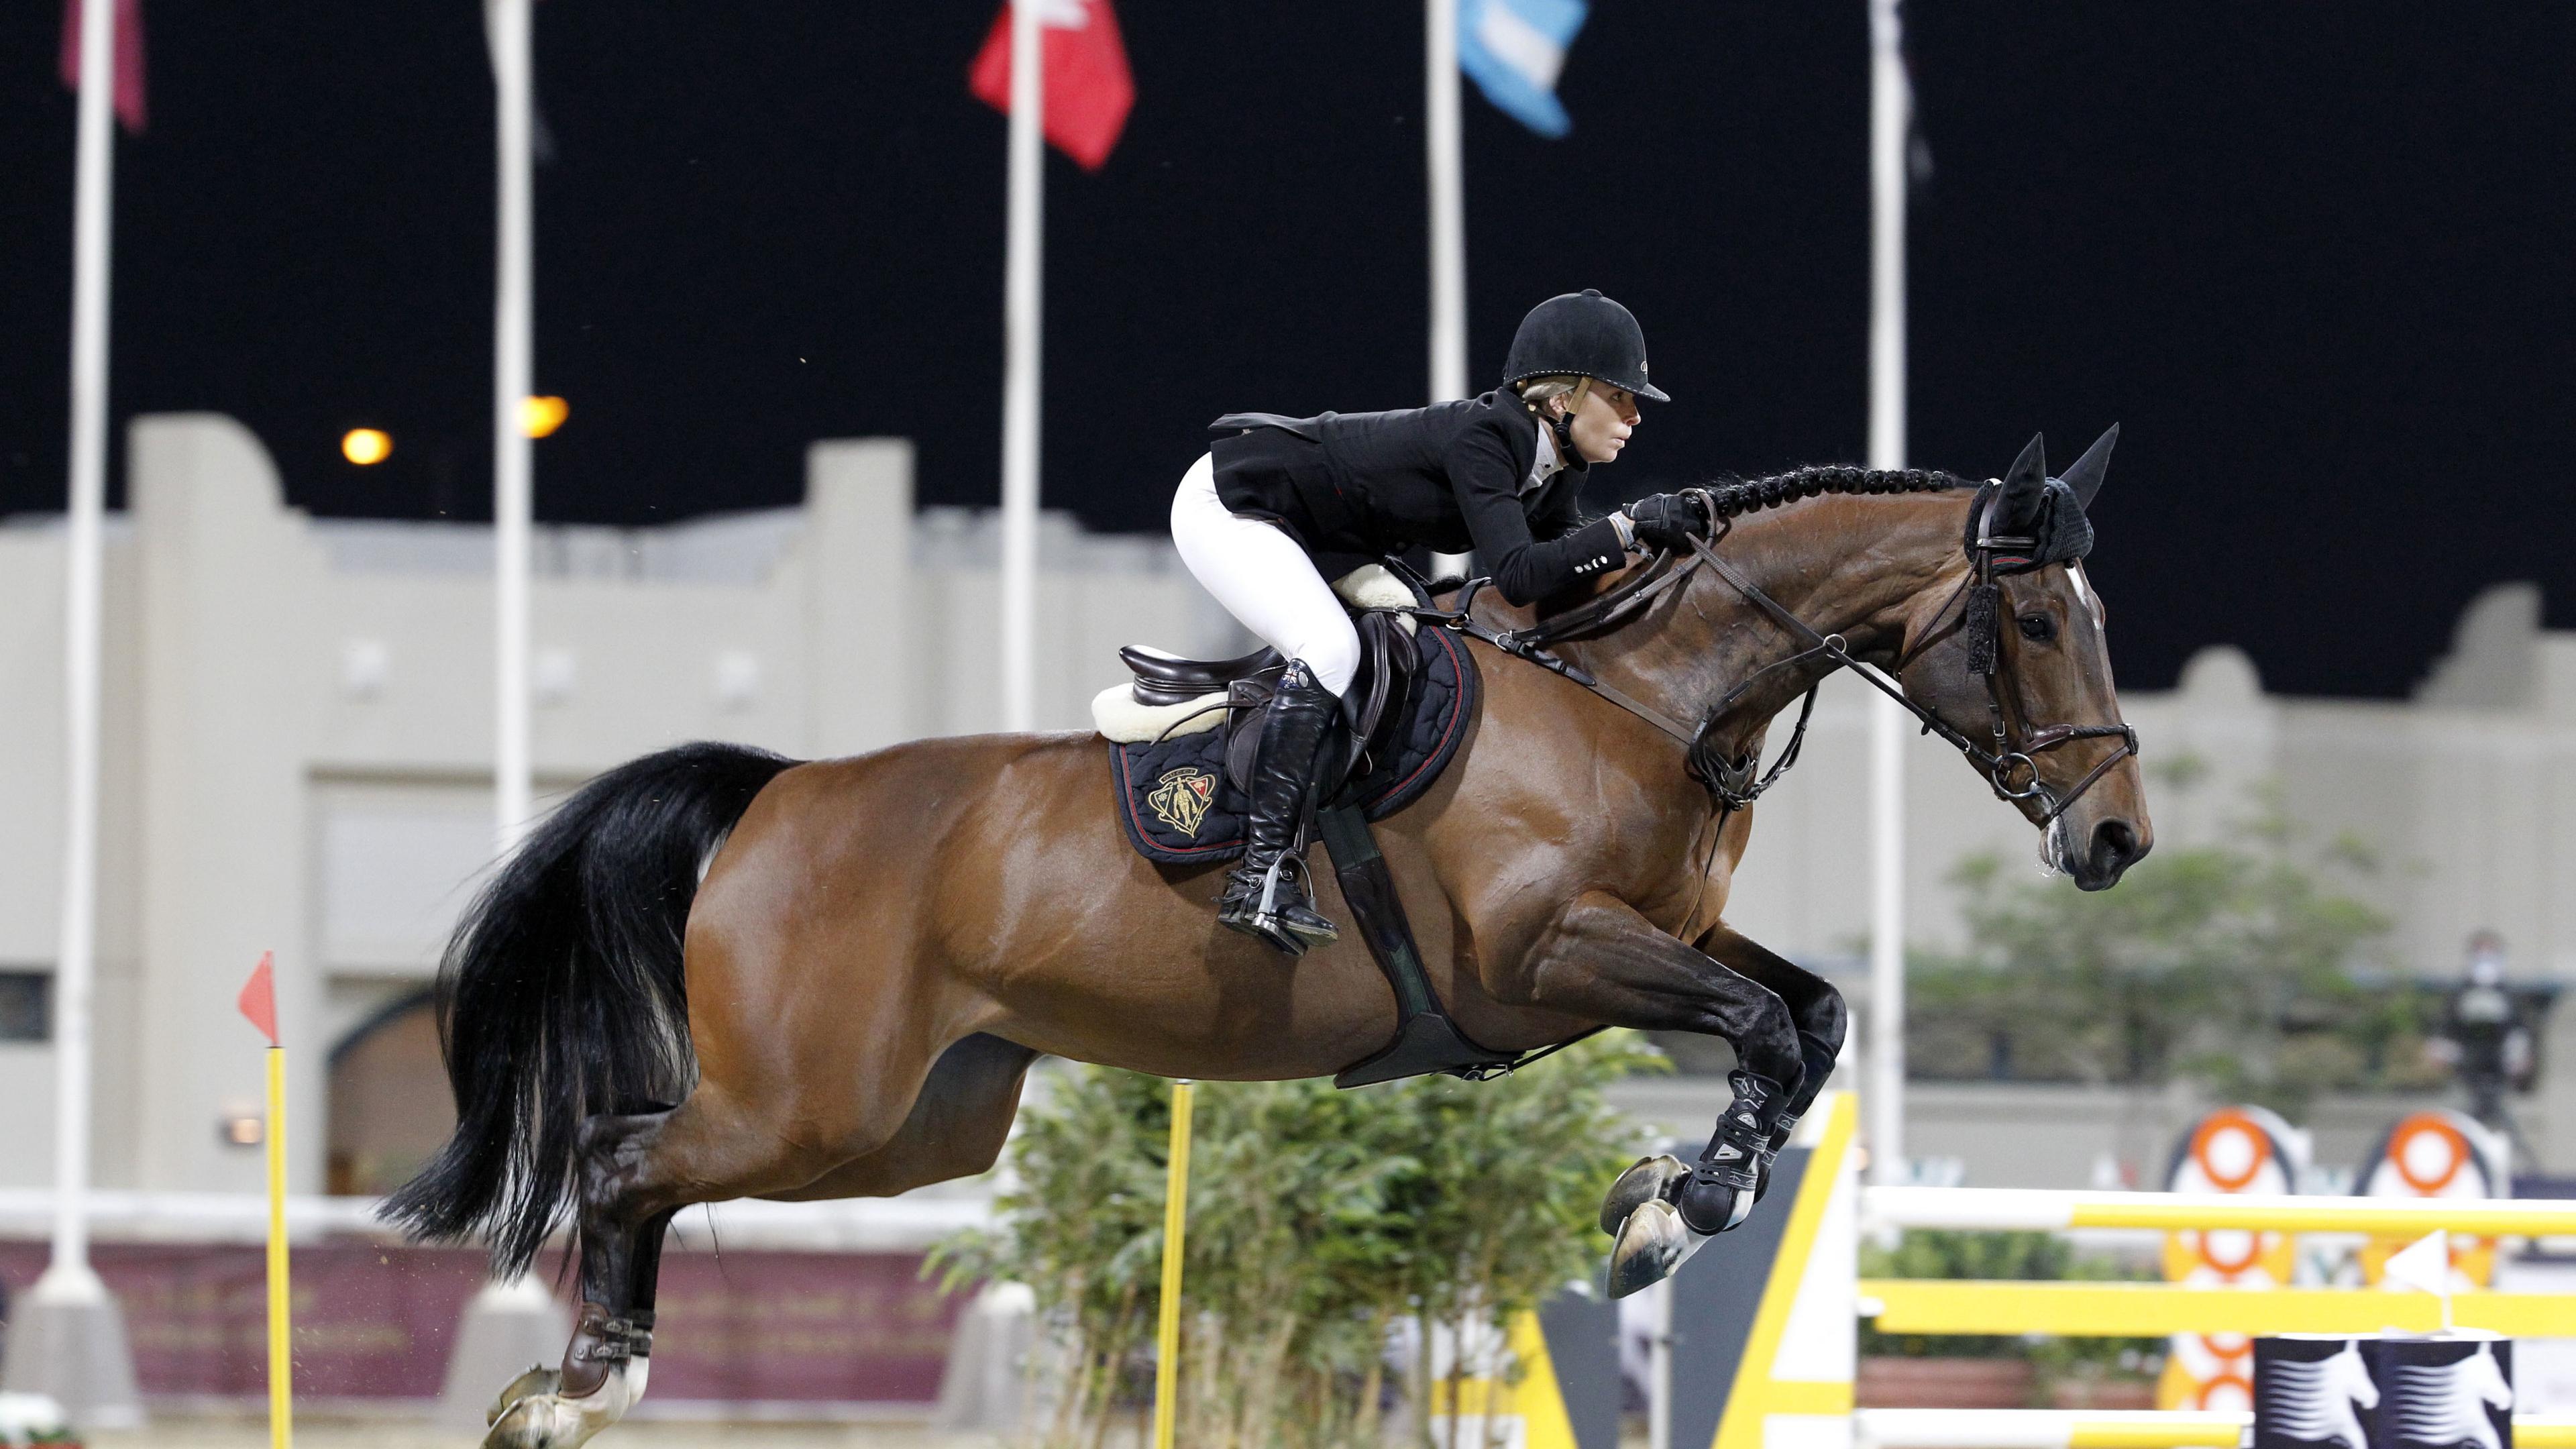 equestrian horse rider 4k 1540063420 - equestrian, horse, rider 4k - rider, horse, equestrian